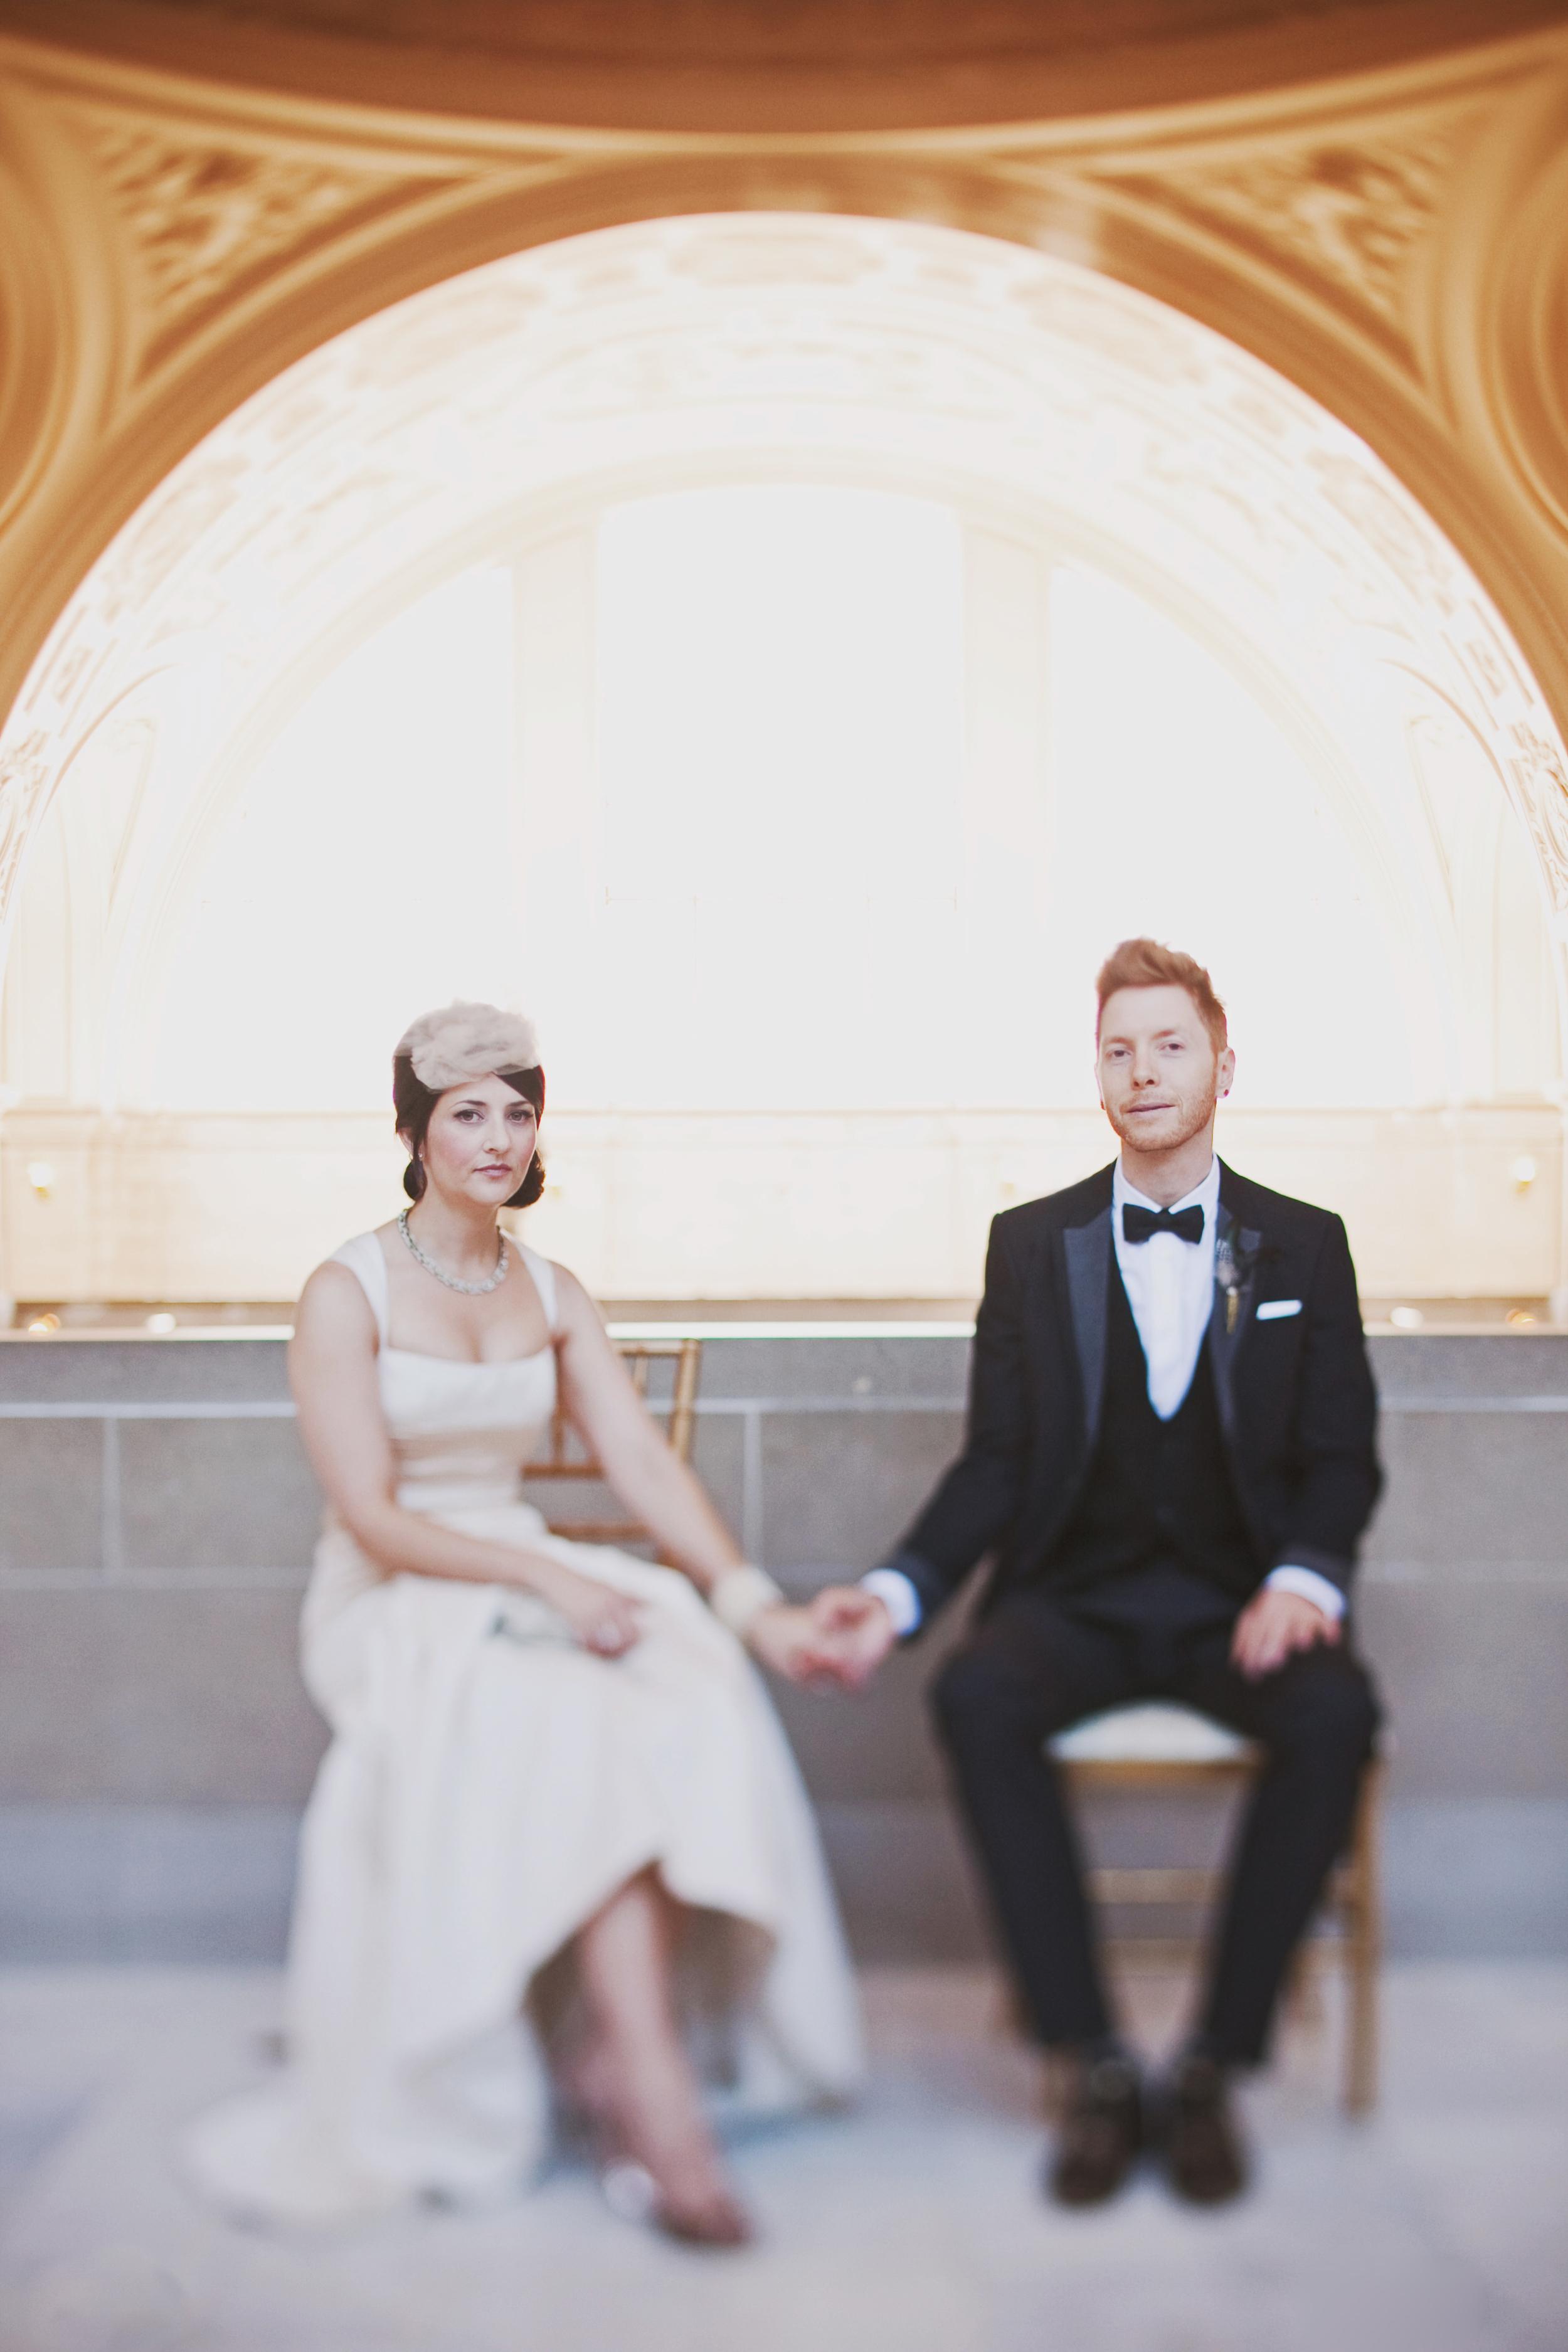 San_Francisco_City_Hall_Wedding_Photography_Cori_EB-01.JPG